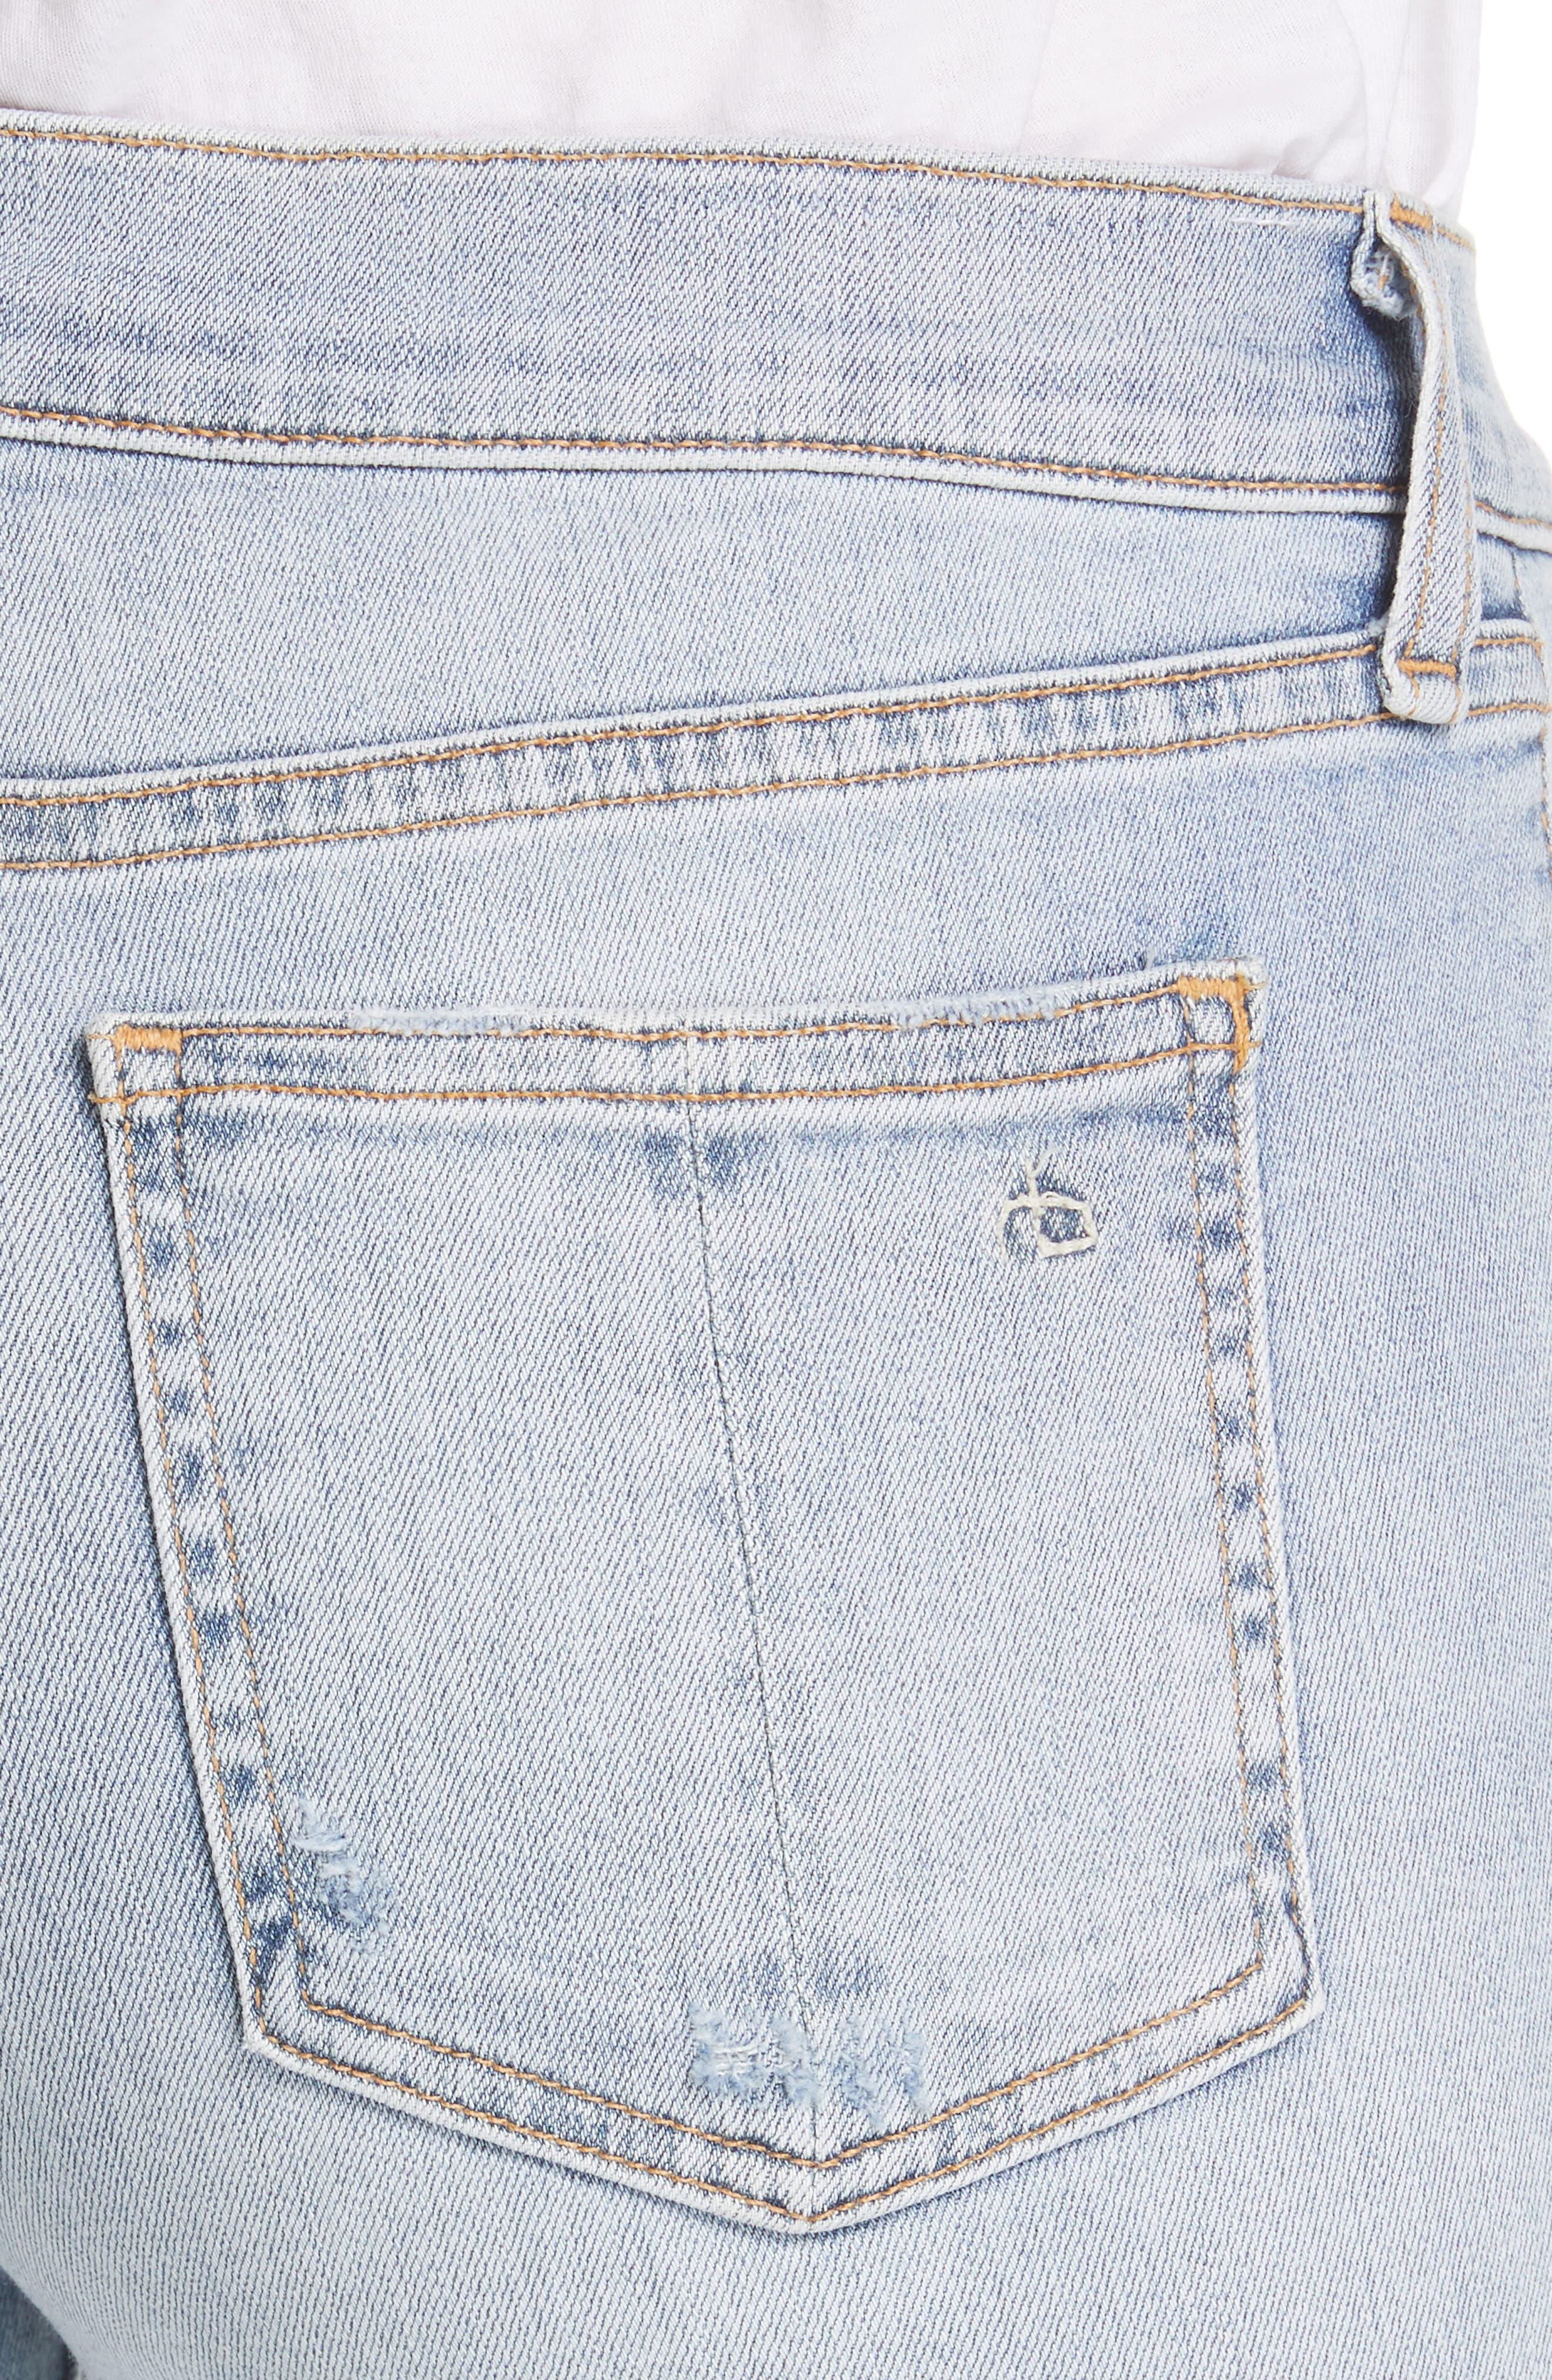 RAG & BONE, JEAN Ripped Ankle Skinny Jeans, Alternate thumbnail 5, color, 450